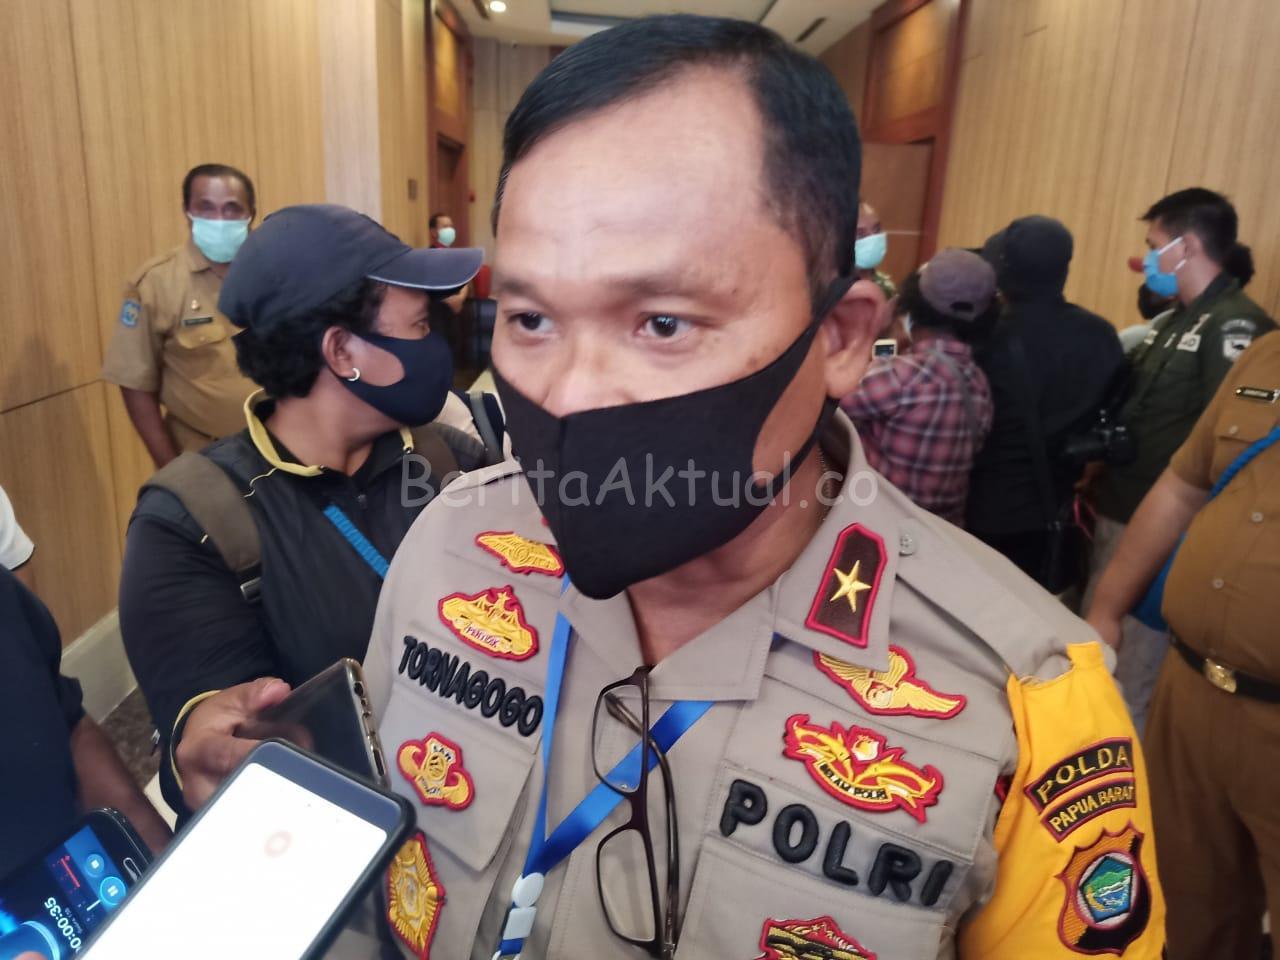 Polda Papua Barat Naik Tipe A, Akan Dipimpin Jenderal Bintang Dua 1 IMG 20200420 WA0055